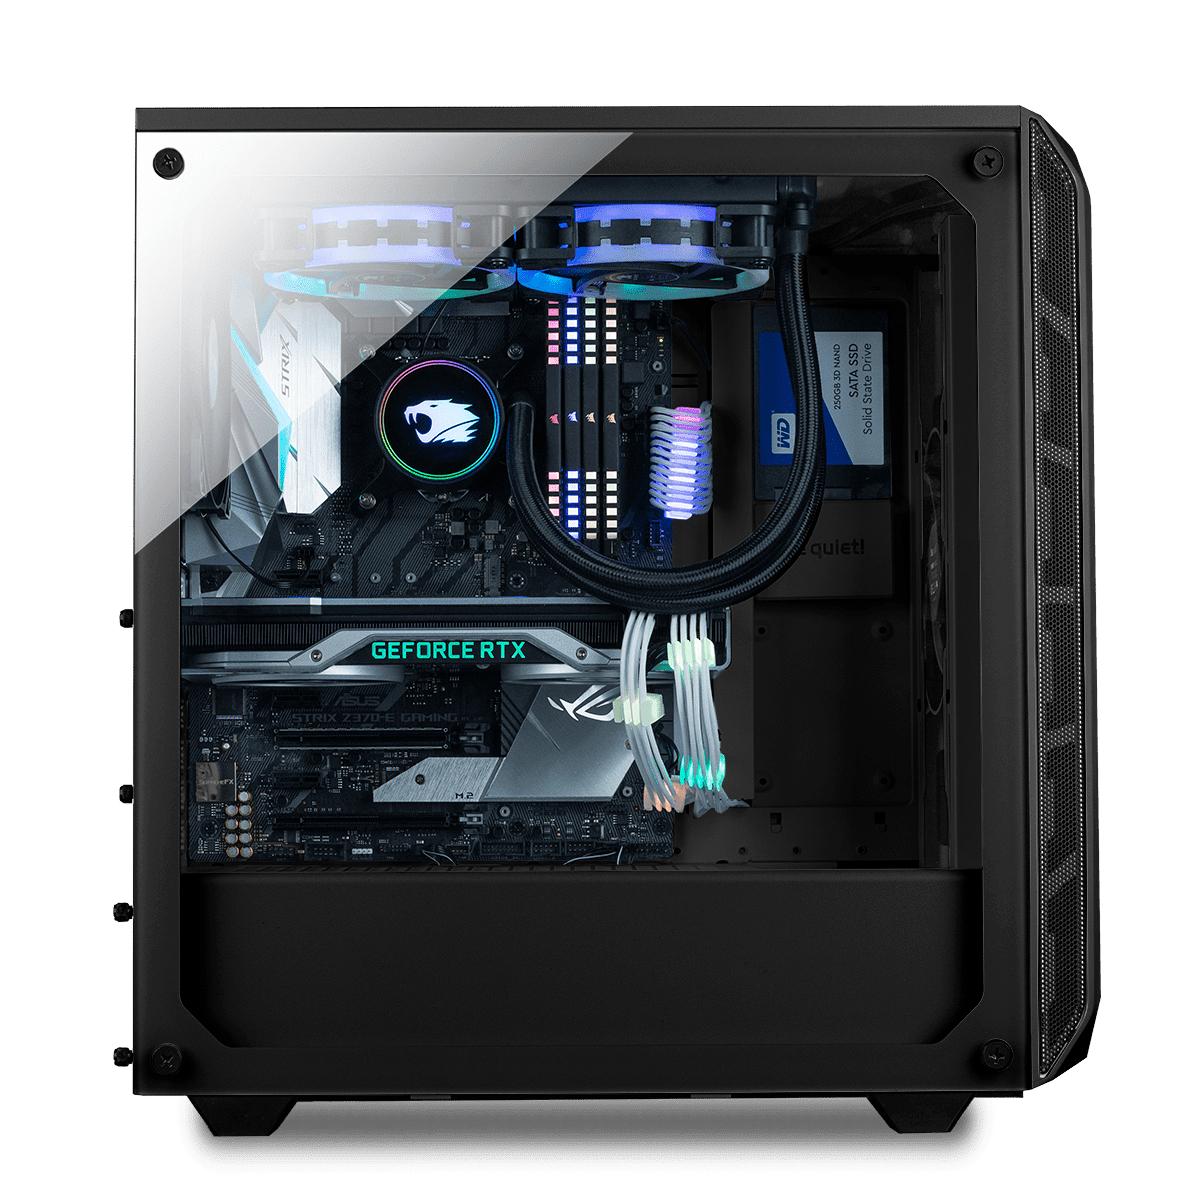 PC Gamer Intel Paladin - i5-10600k, 26Go RAM, 1To SSD, Z590 Phantom Gaming 4, RX 6700 XT, Alim. 500W, AIO RGB 240mm, Sans OS (ibuypower.de)